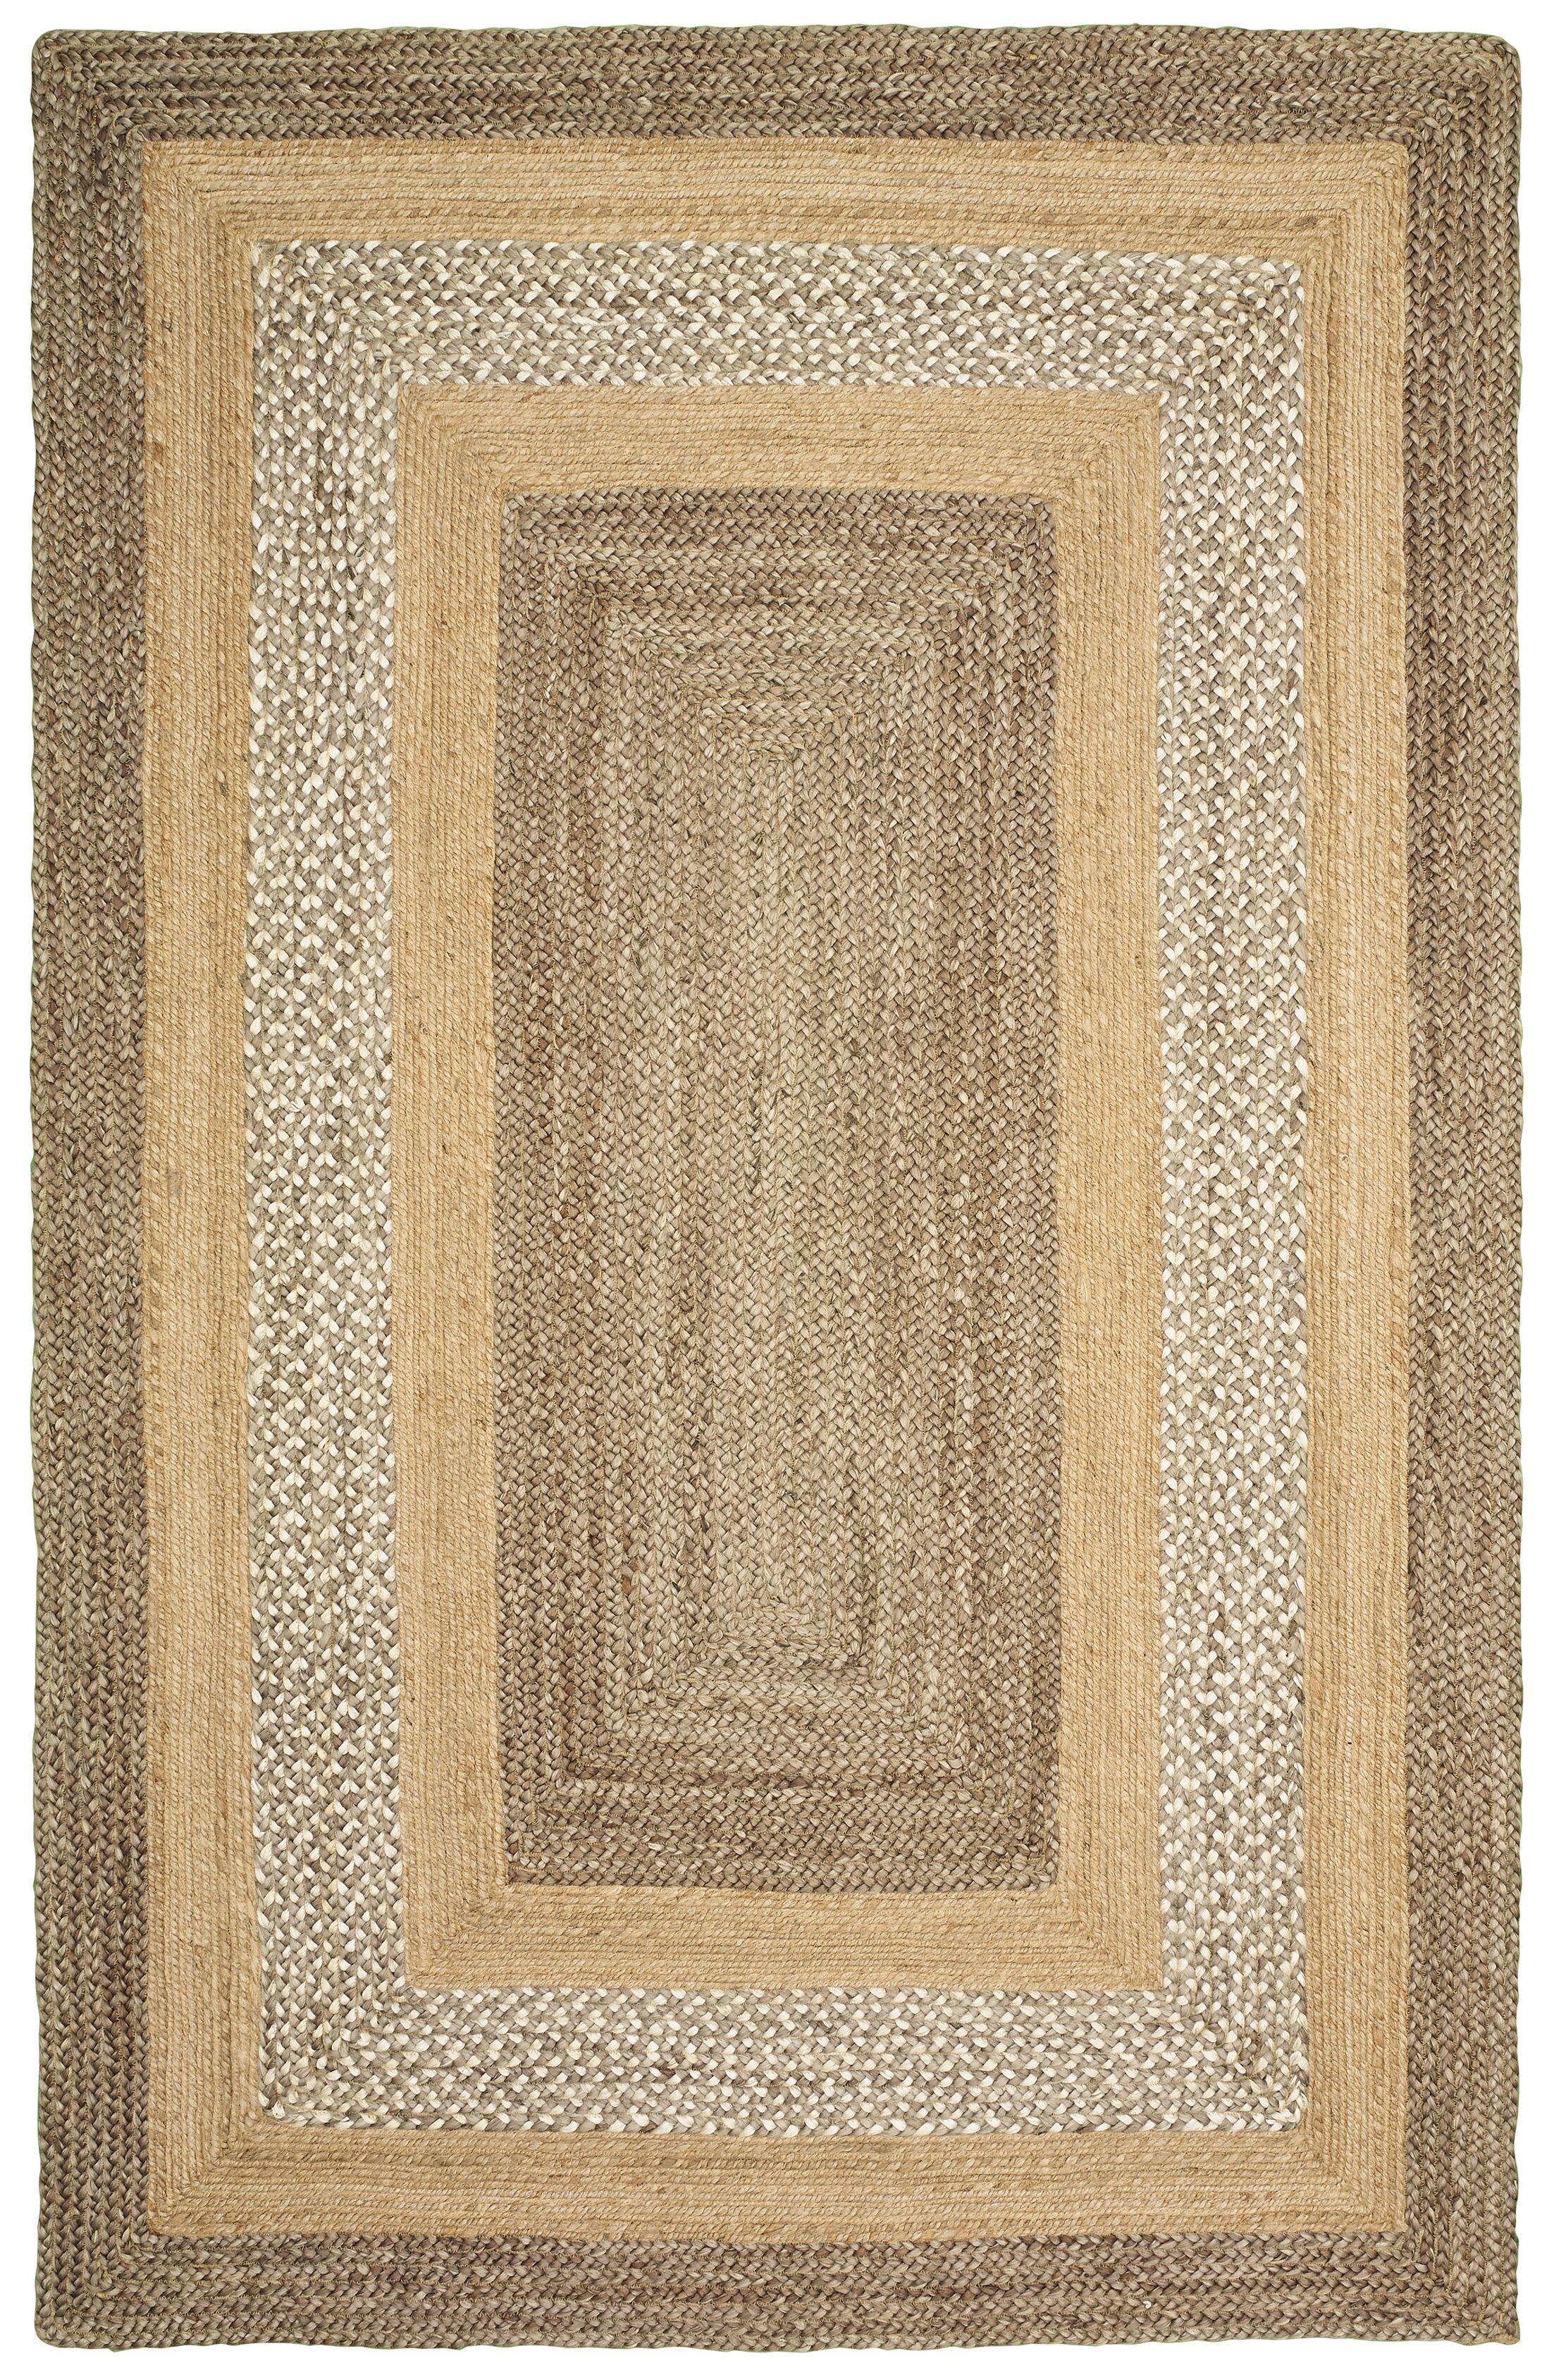 Lechez Hand-Woven Gray/Beige Area Rug Rug Size: 5' x 7'9